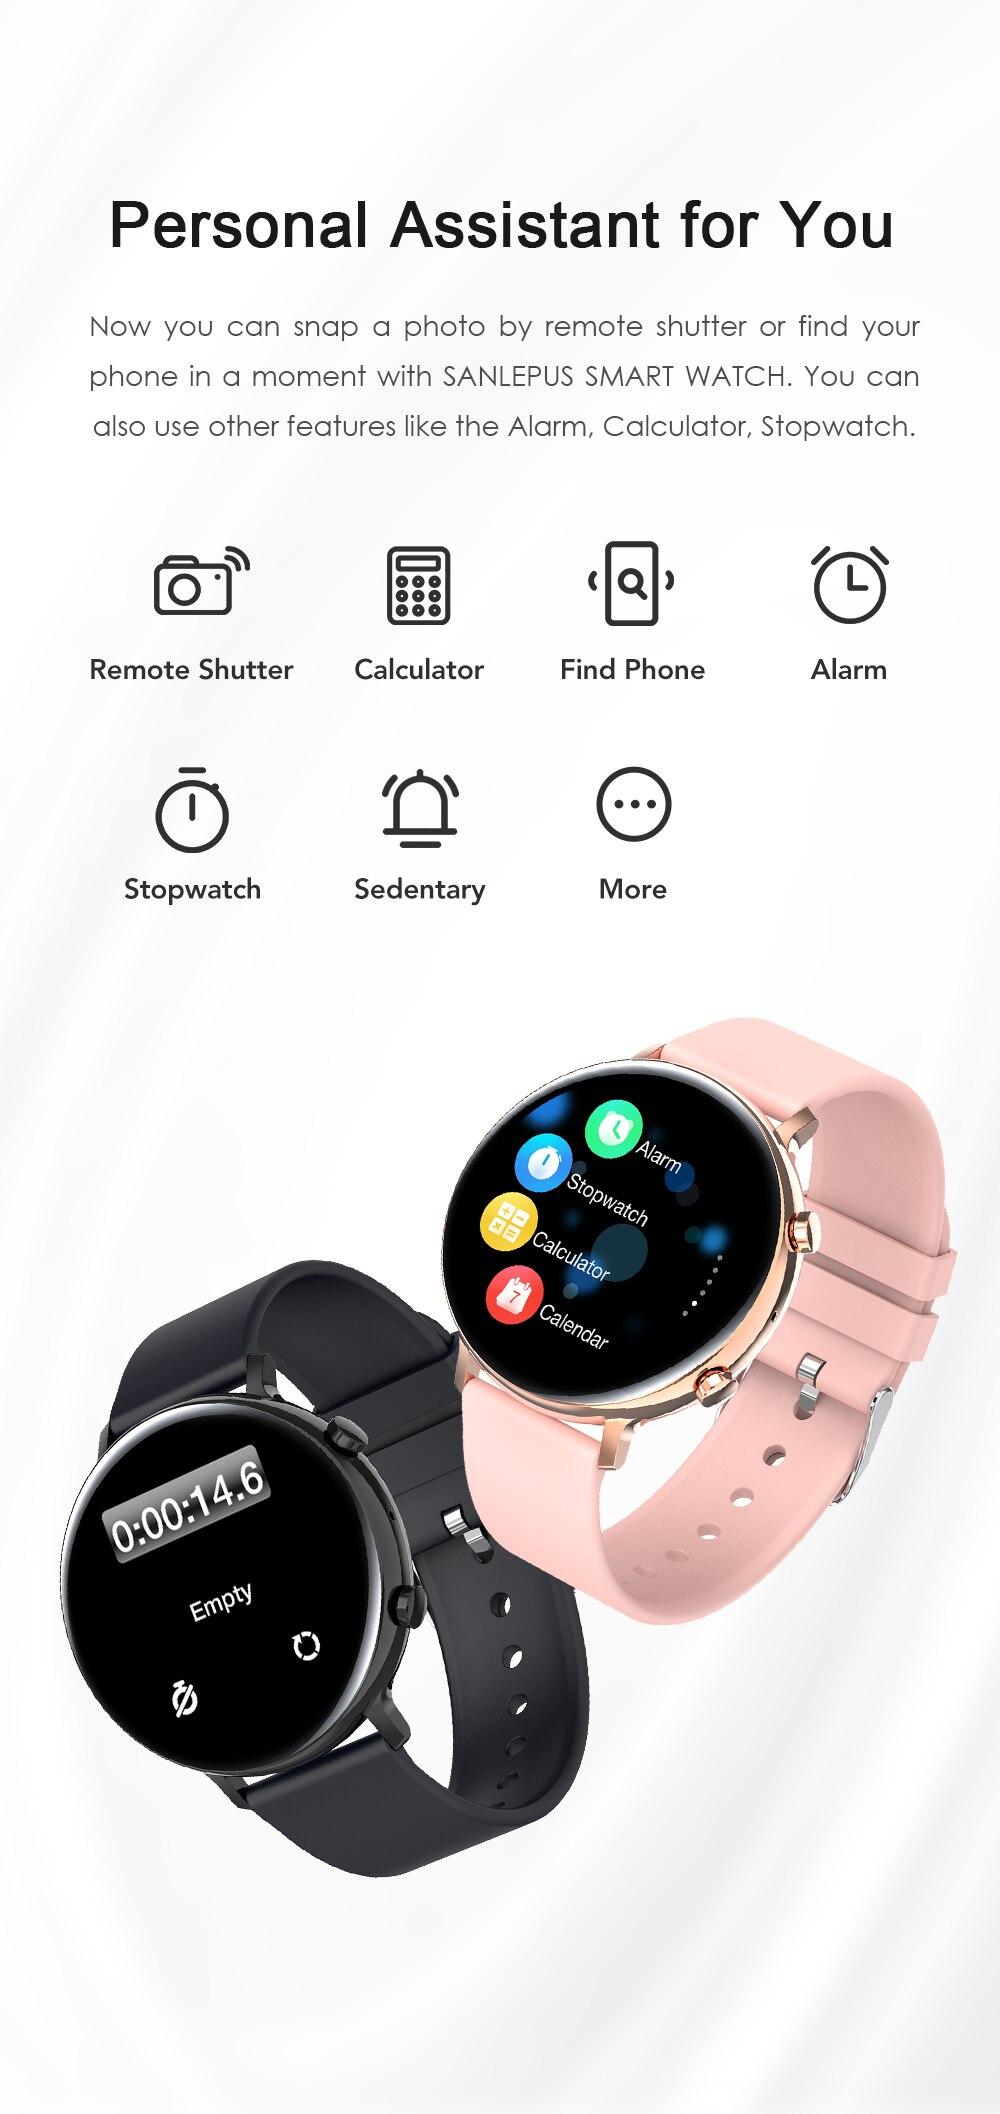 Hed1592493cff4ebc9cdb539b91063d66g SANLEPUS 2021 Smart Watch Dial Calls Men Women Waterproof Smartwatch ECG PPG Fitness Bracelet Band For Android Apple Xiaomi